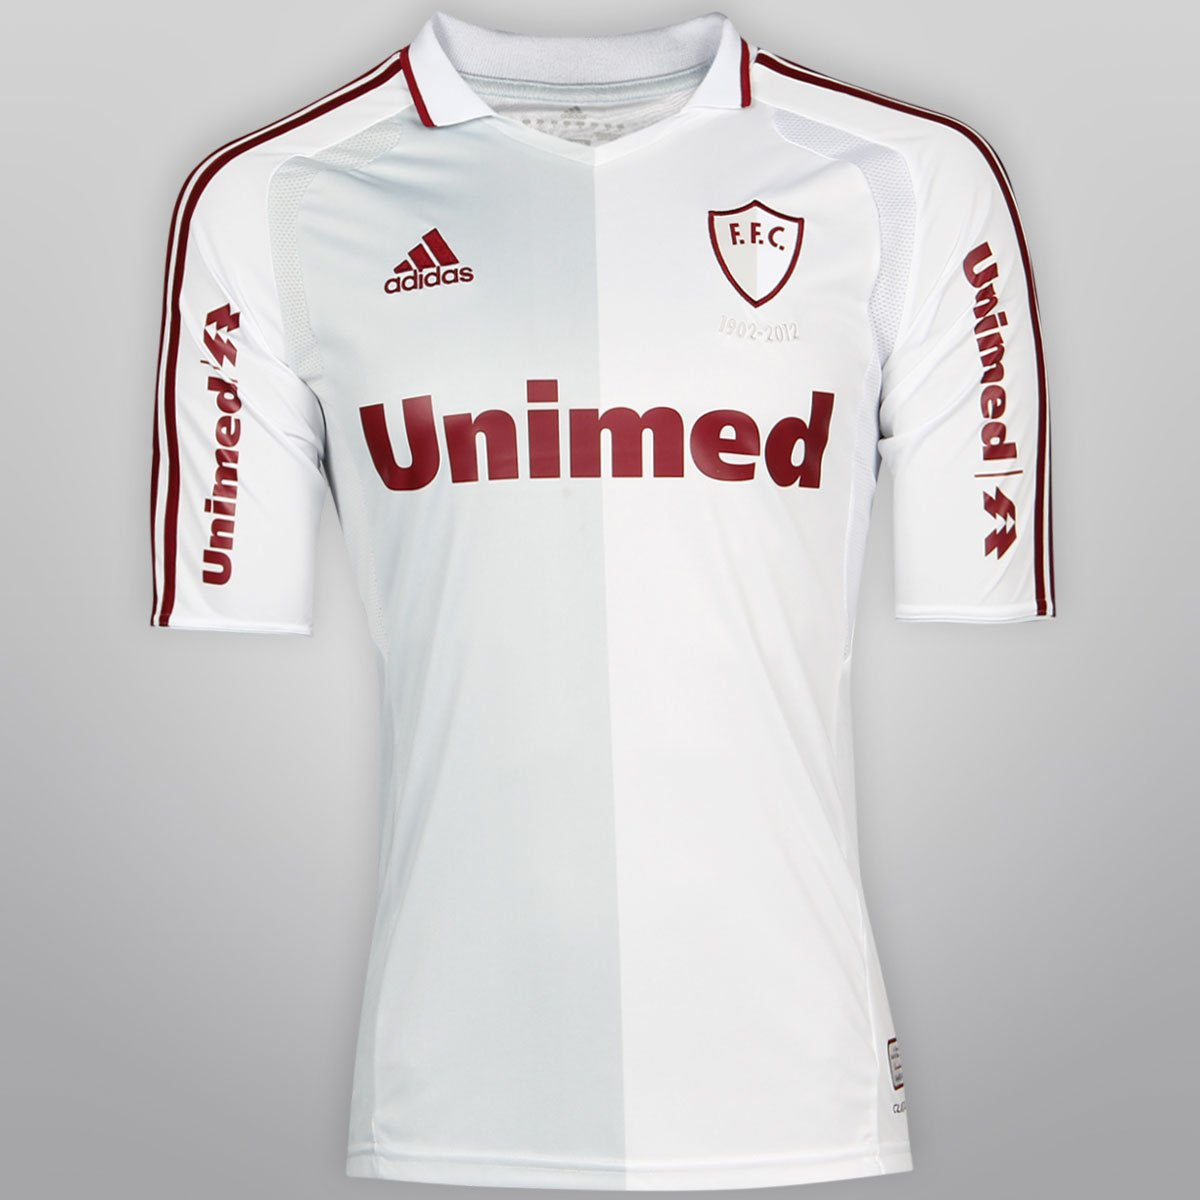 107a2b66e1 Camisa Adidas Fluminense 12 13 s nº - 110 Anos - Ed. Limitada ...